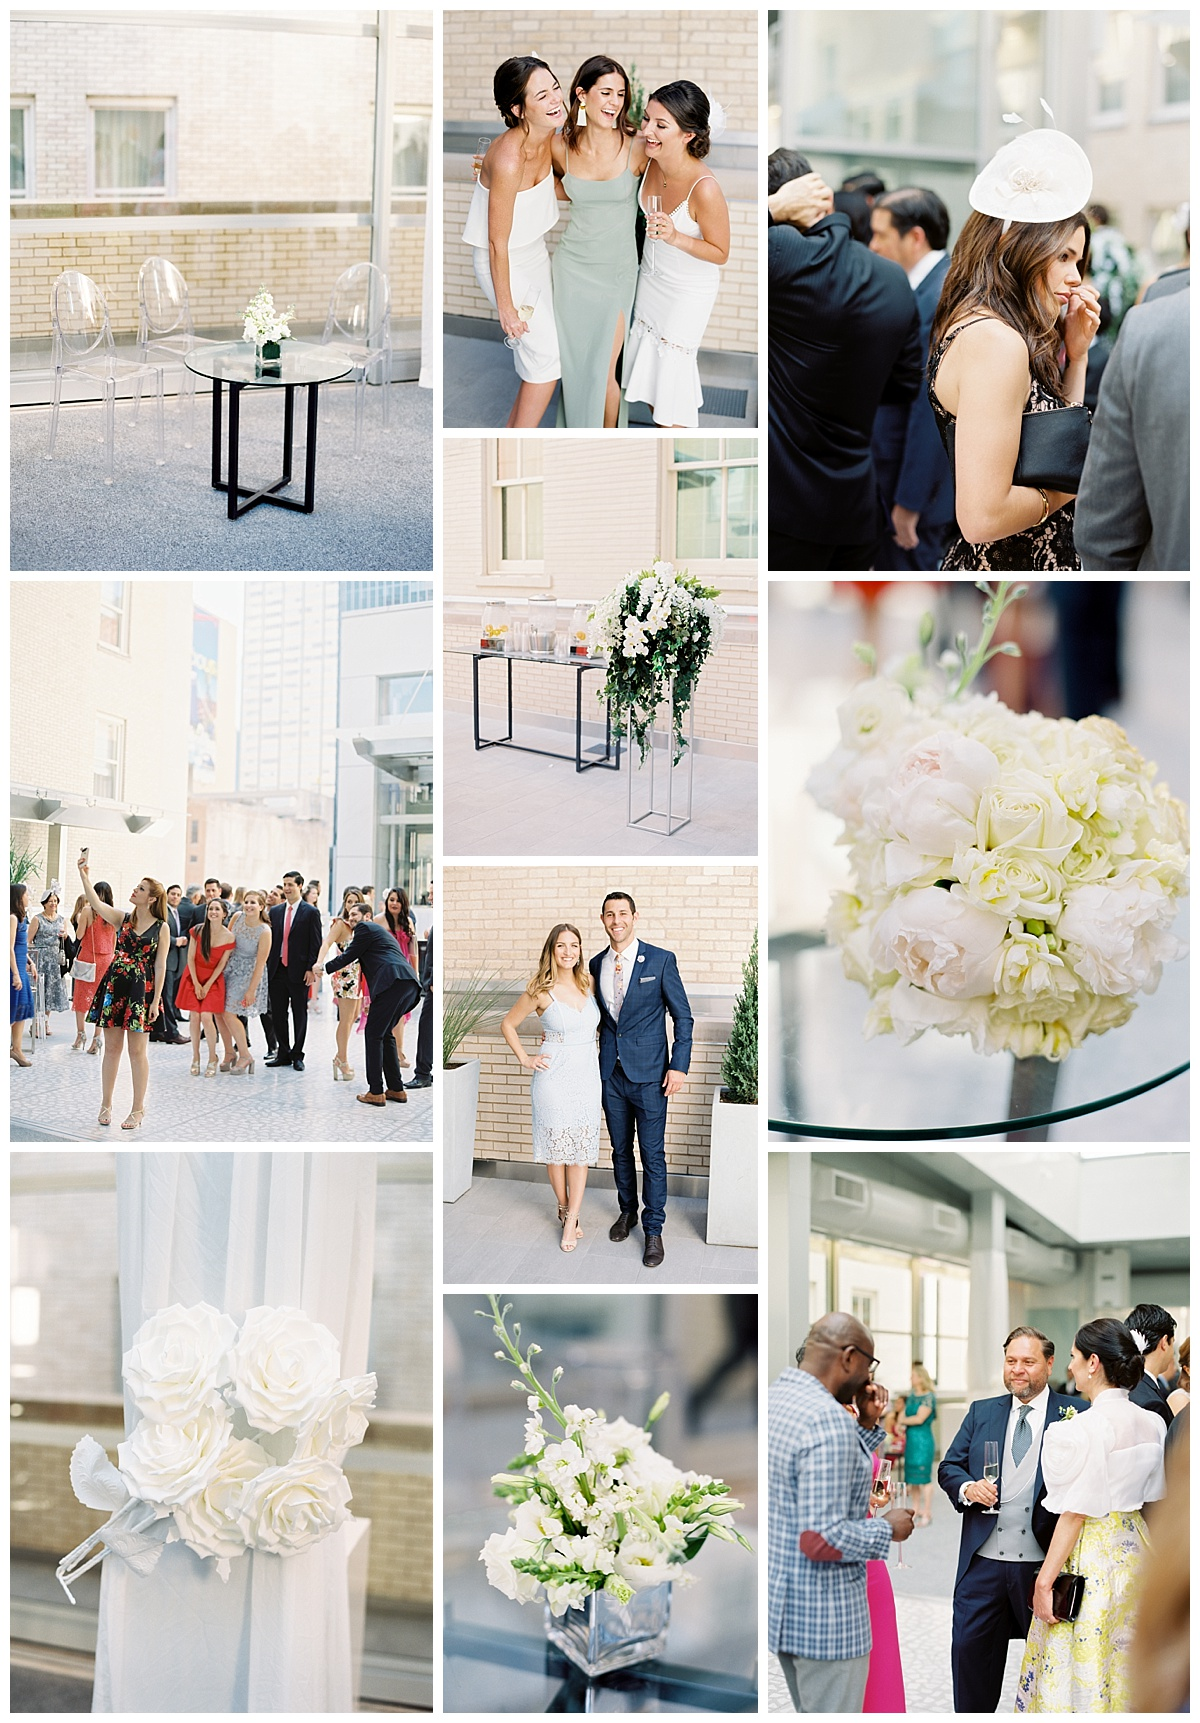 the-joule-dallas-wedding-ar-photography-4.jpg